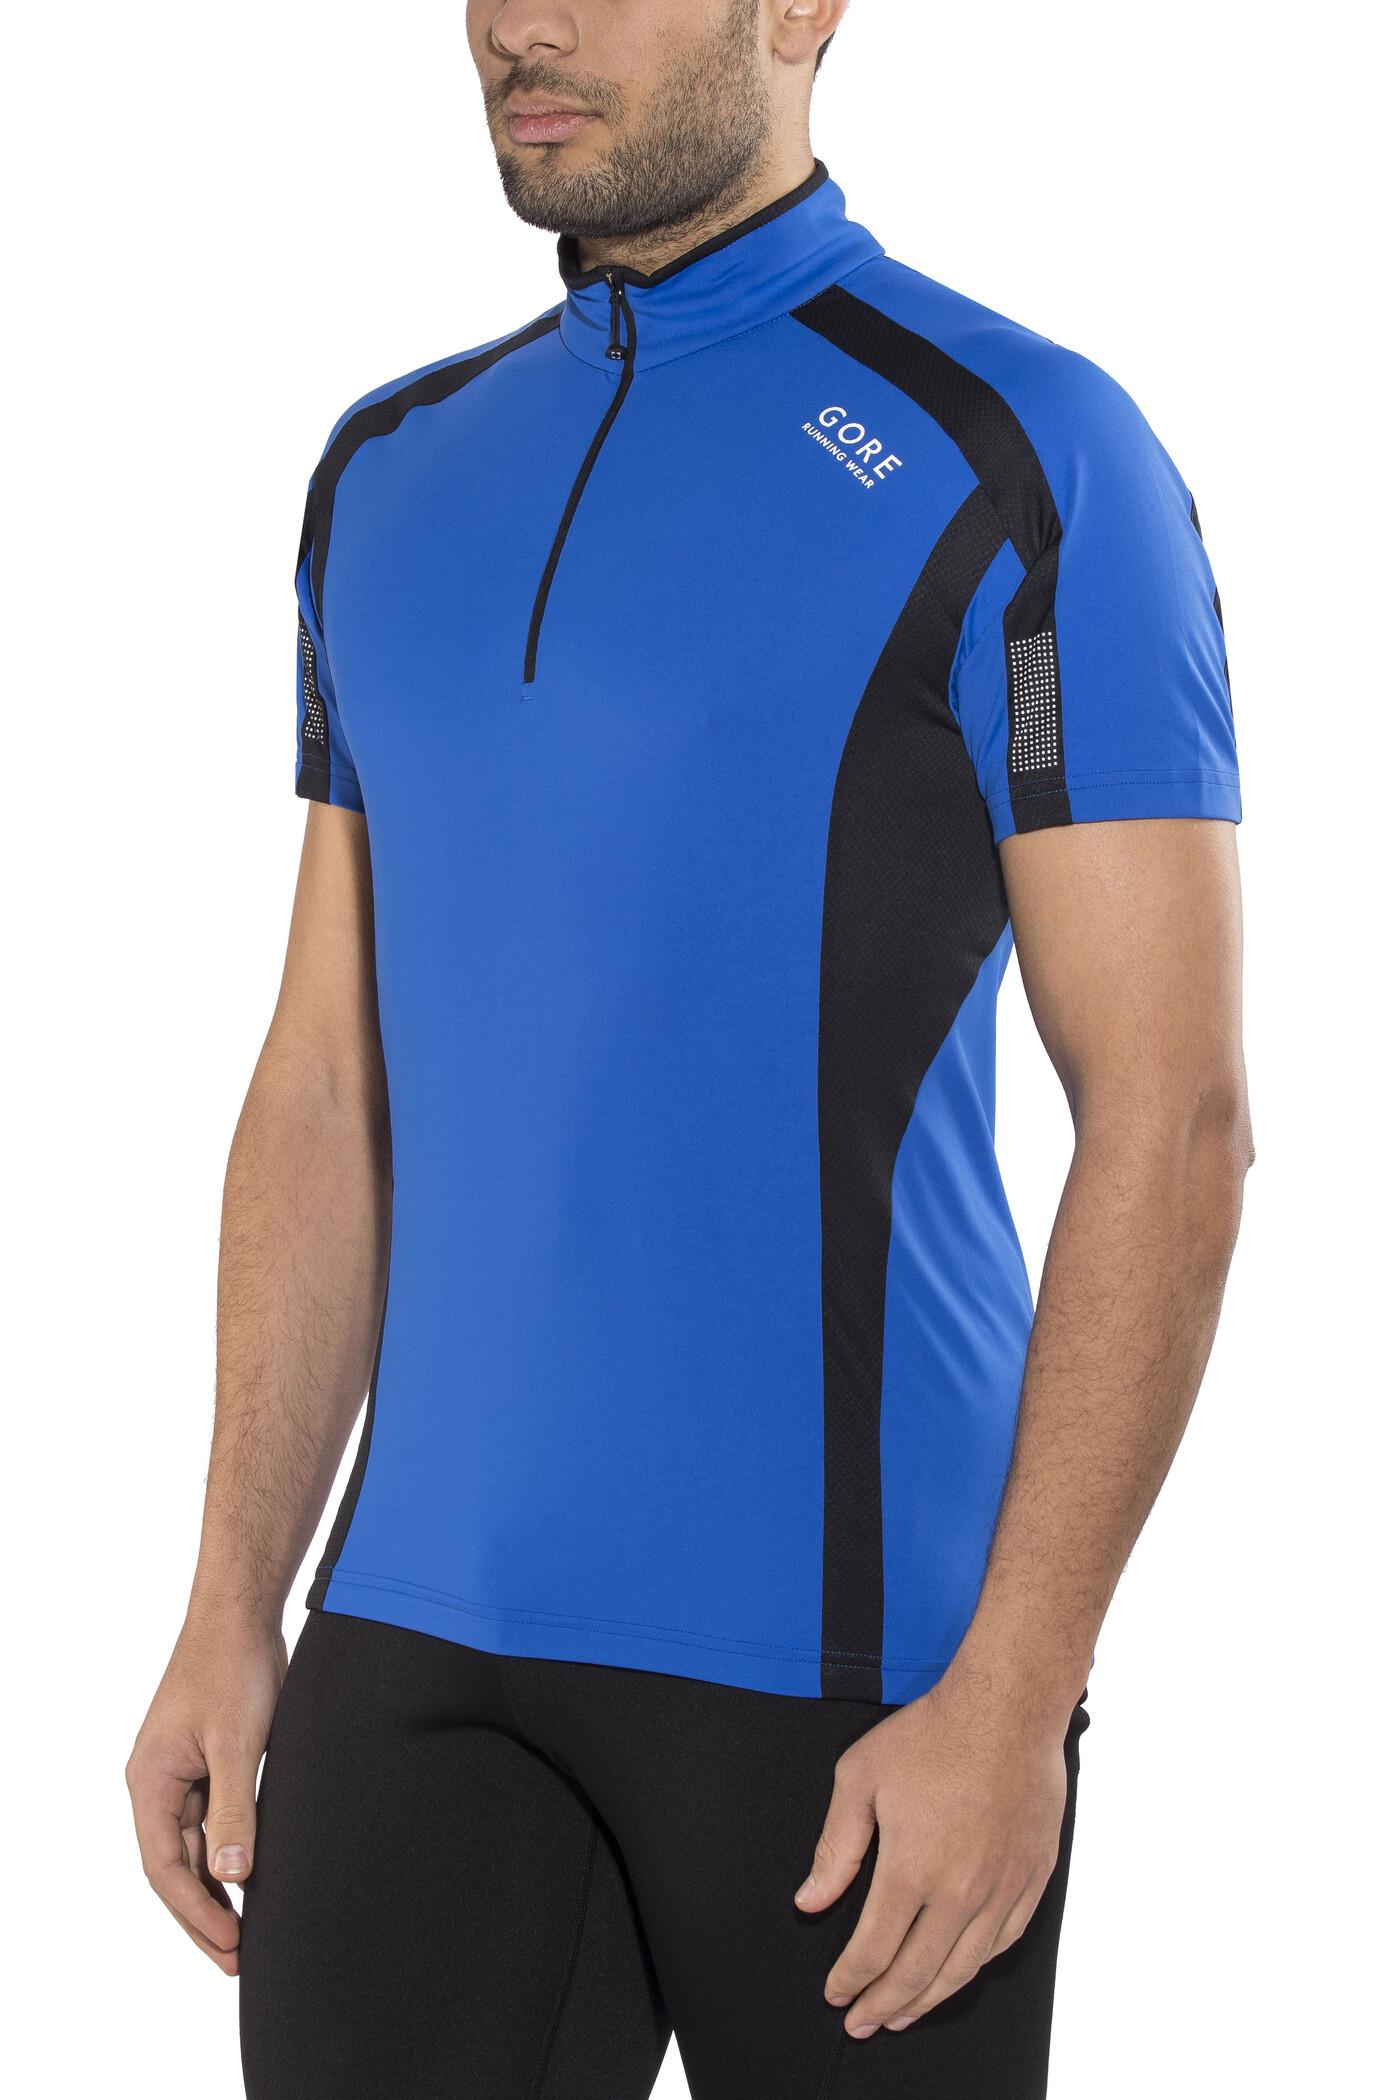 https   www.bikester.ch dakine-hellion-knee-pad-black-778825.html ... d2278e8cf